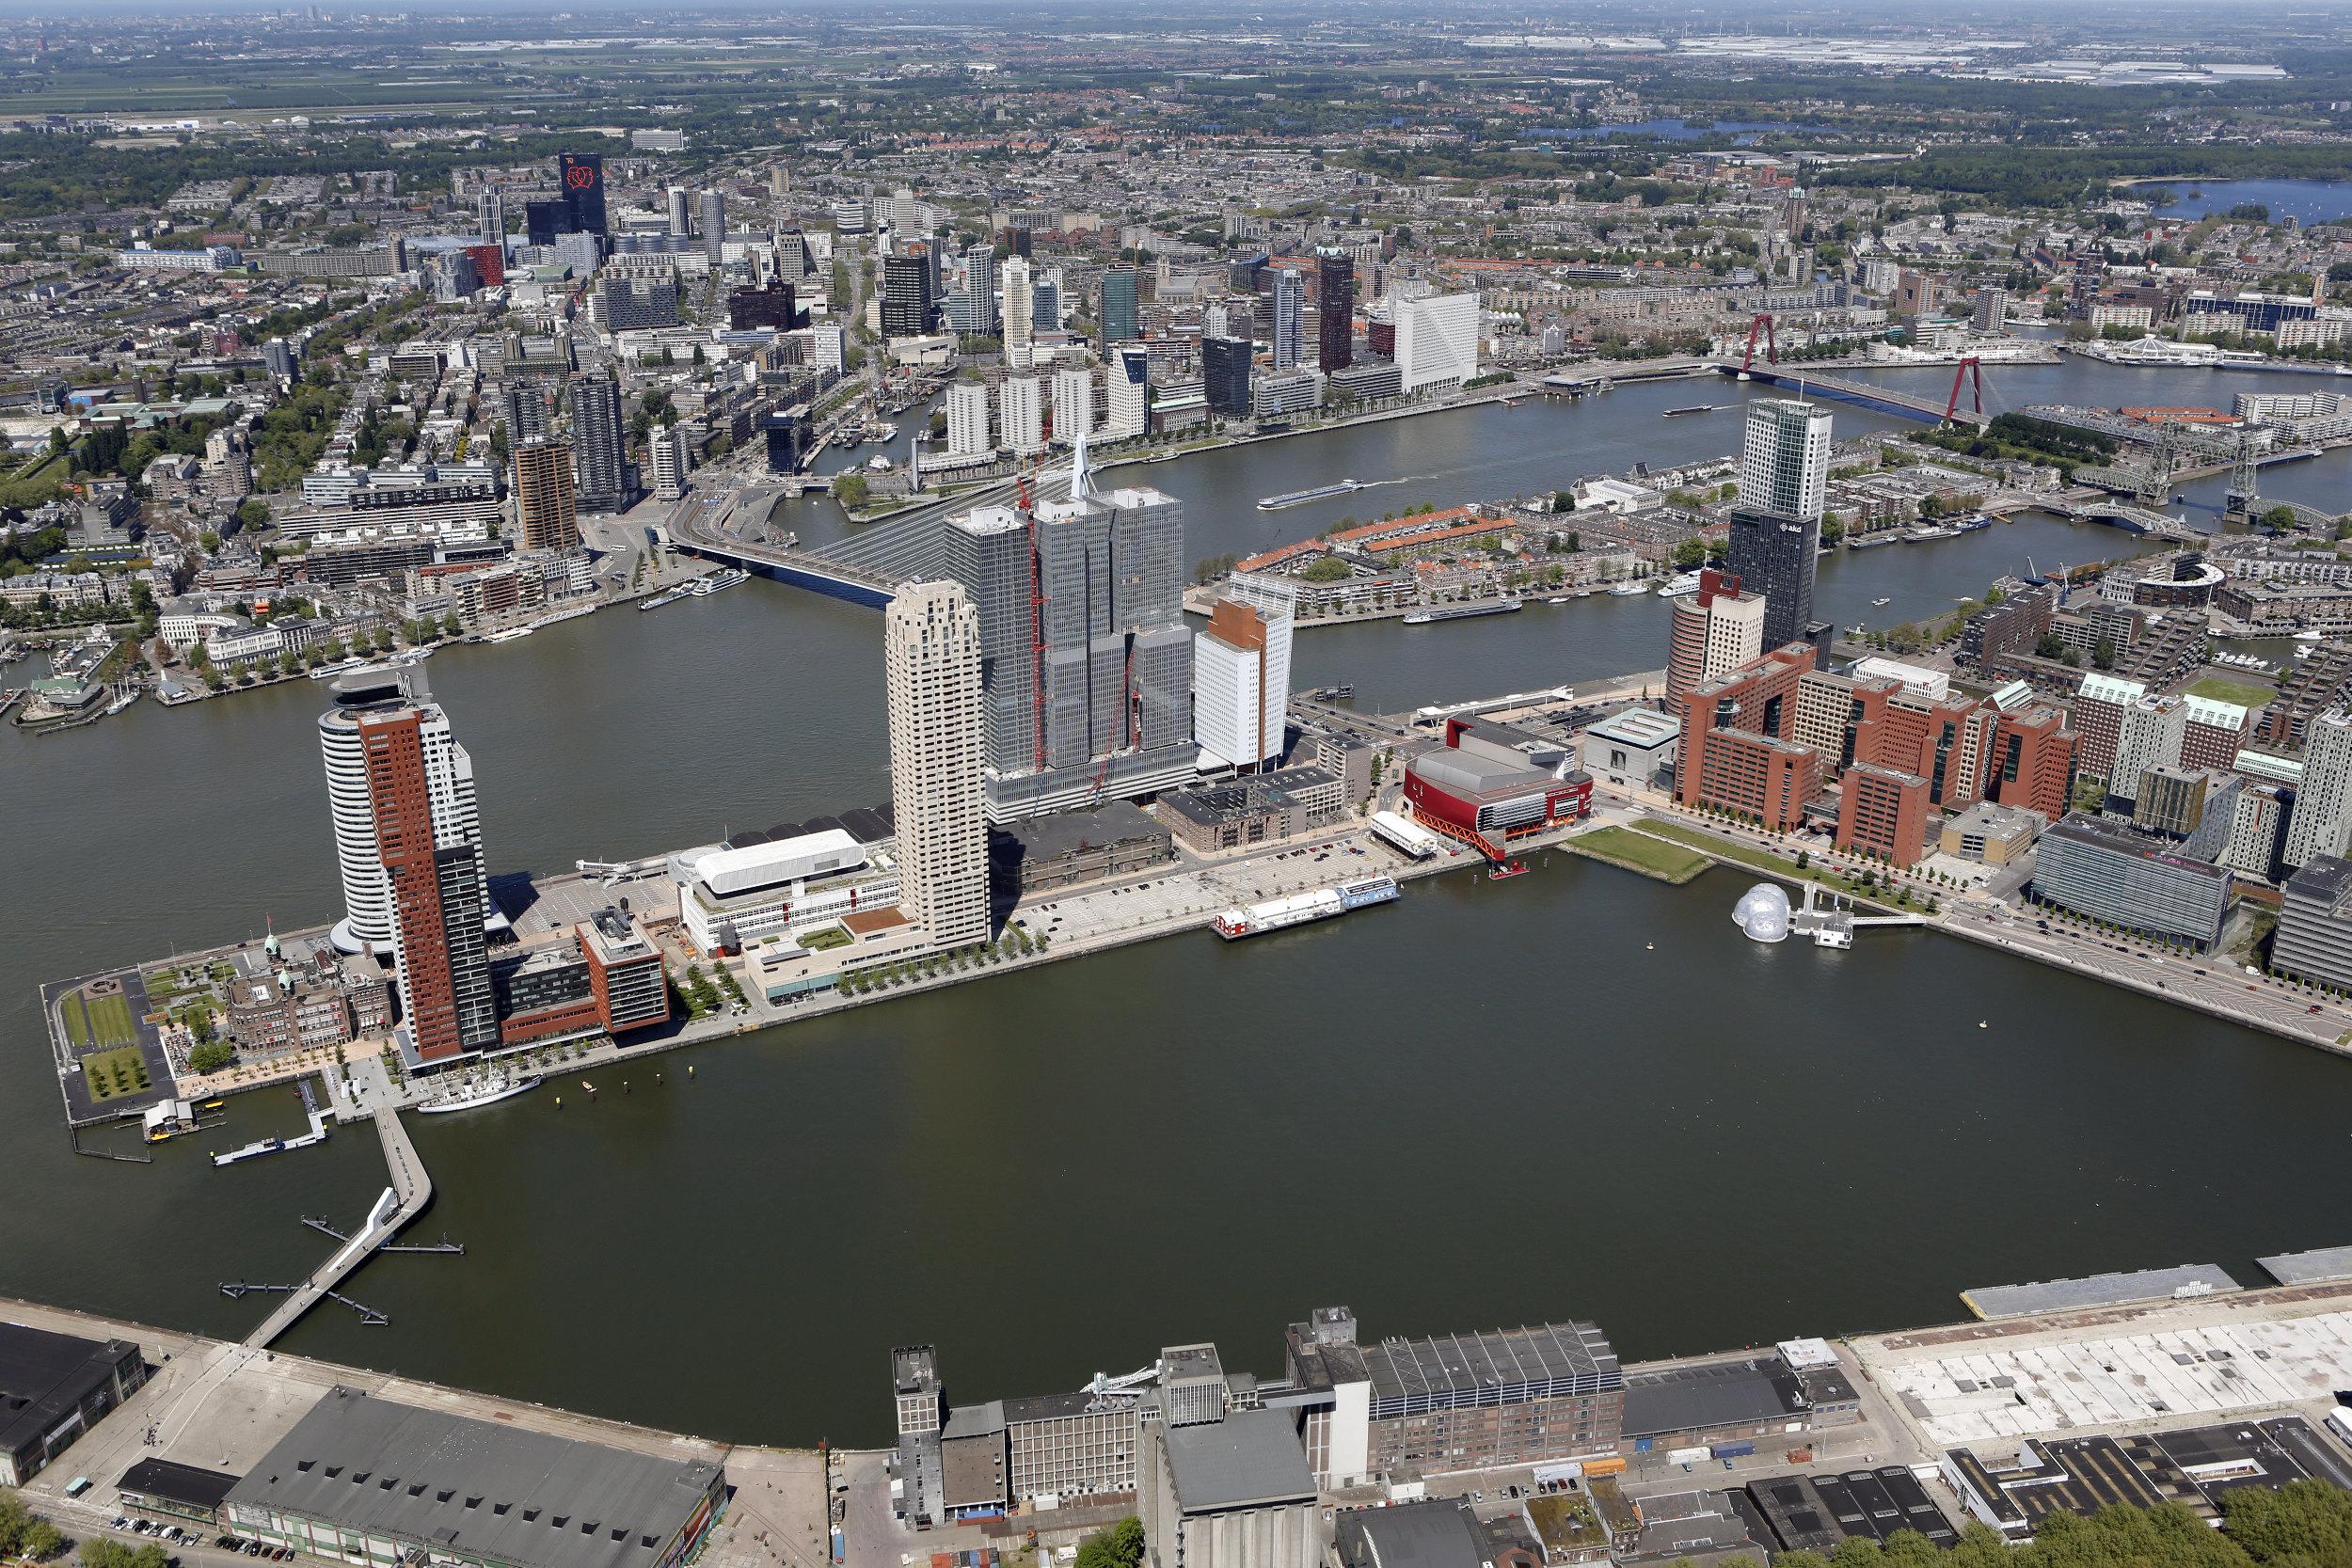 Belastingdienst Kantoor Rotterdam : Belastingdienst kantoor rotterdam awesome belasting nst kantoor